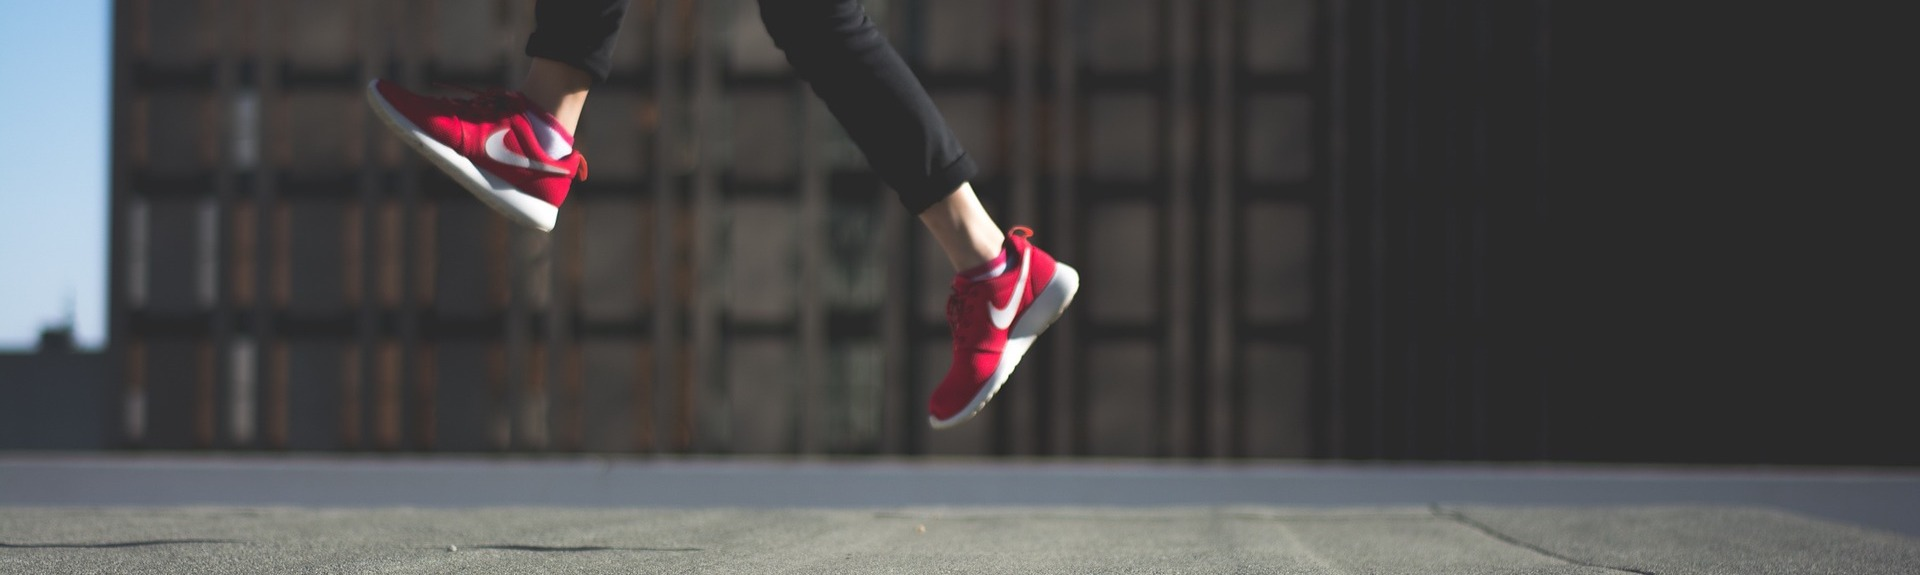 Merkidentiteit Nike